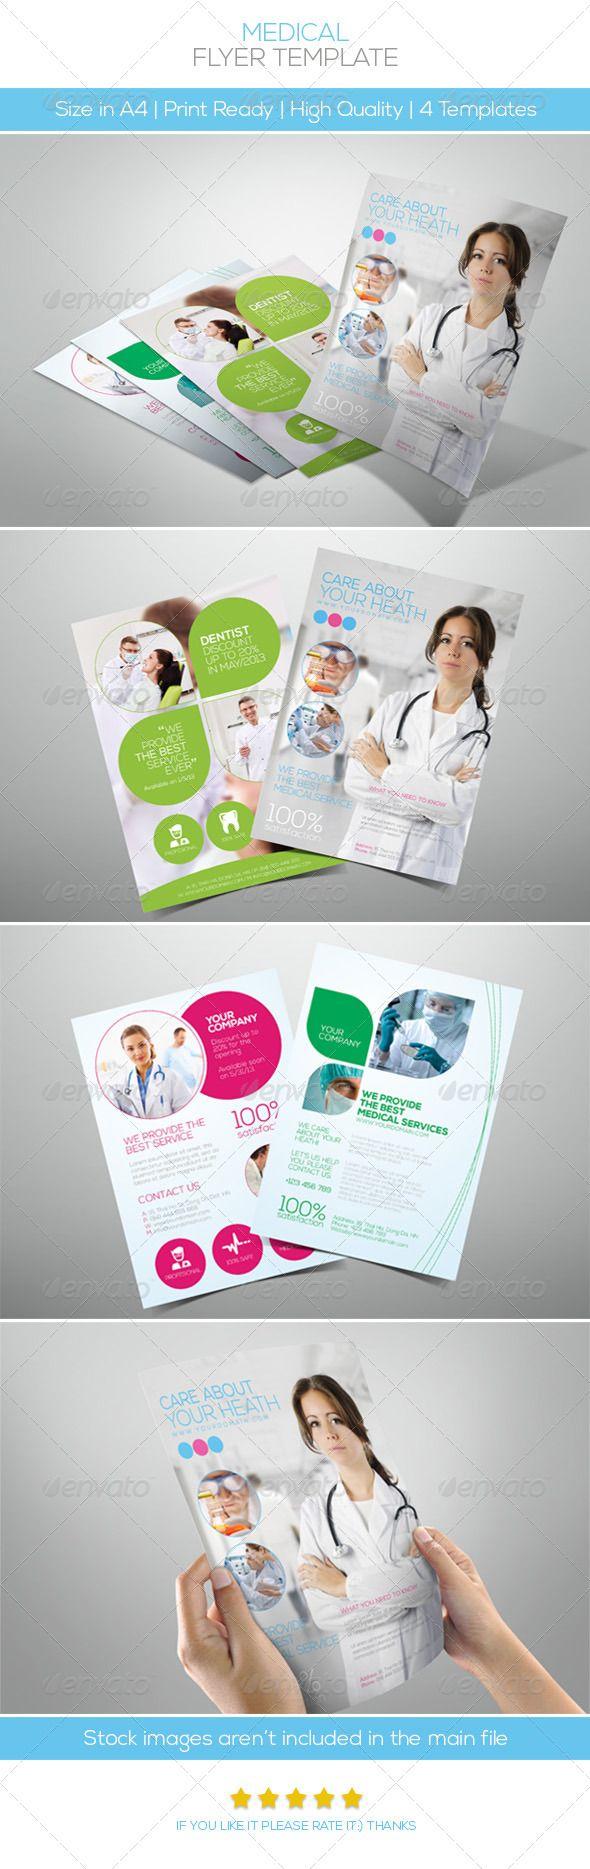 Premium Medical Flyers